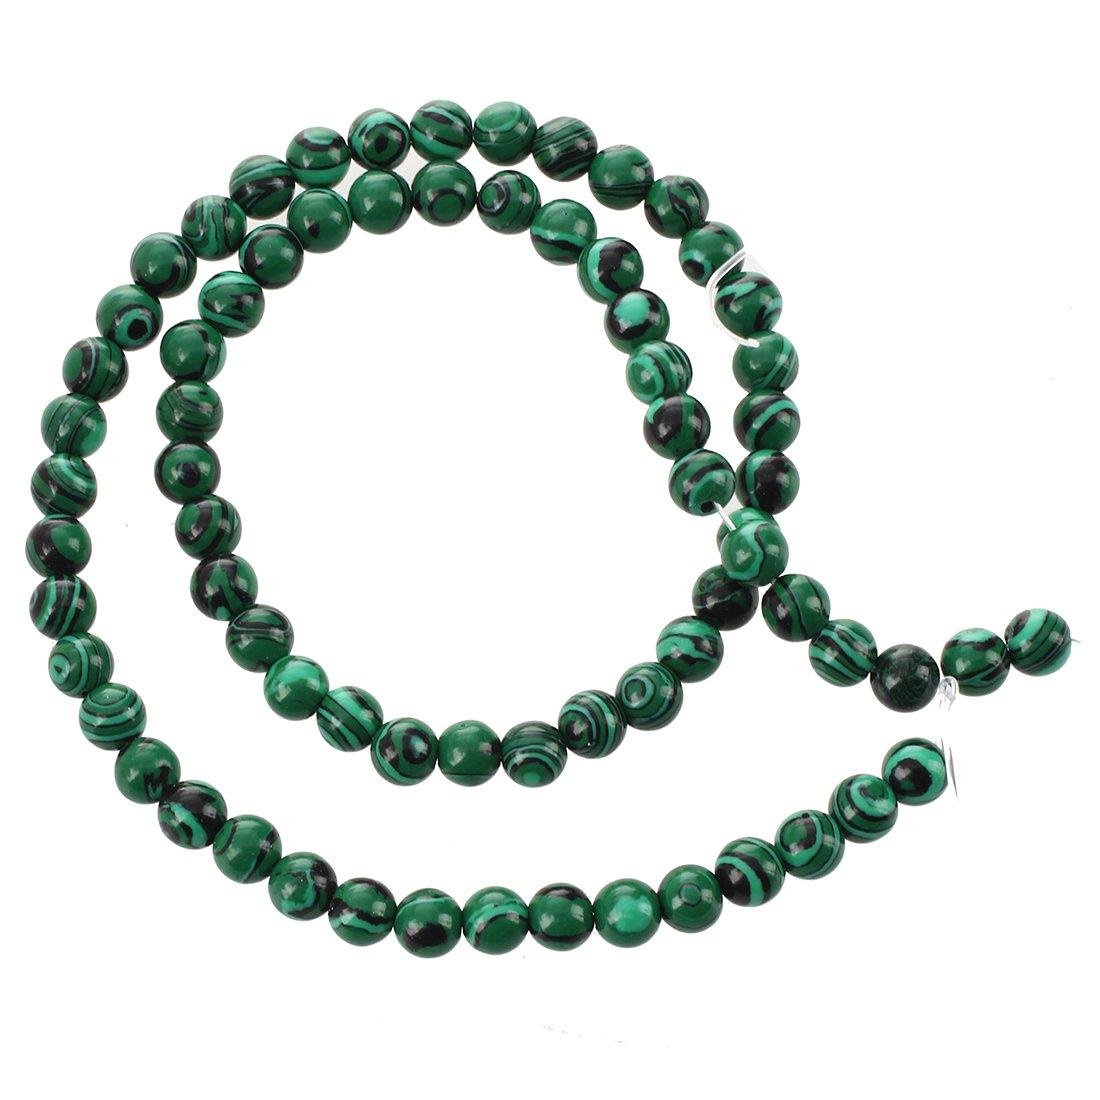 SODIAL(R) Malachite Gemstone Stone Round Loose Beads 6mm Strand HOT 019085